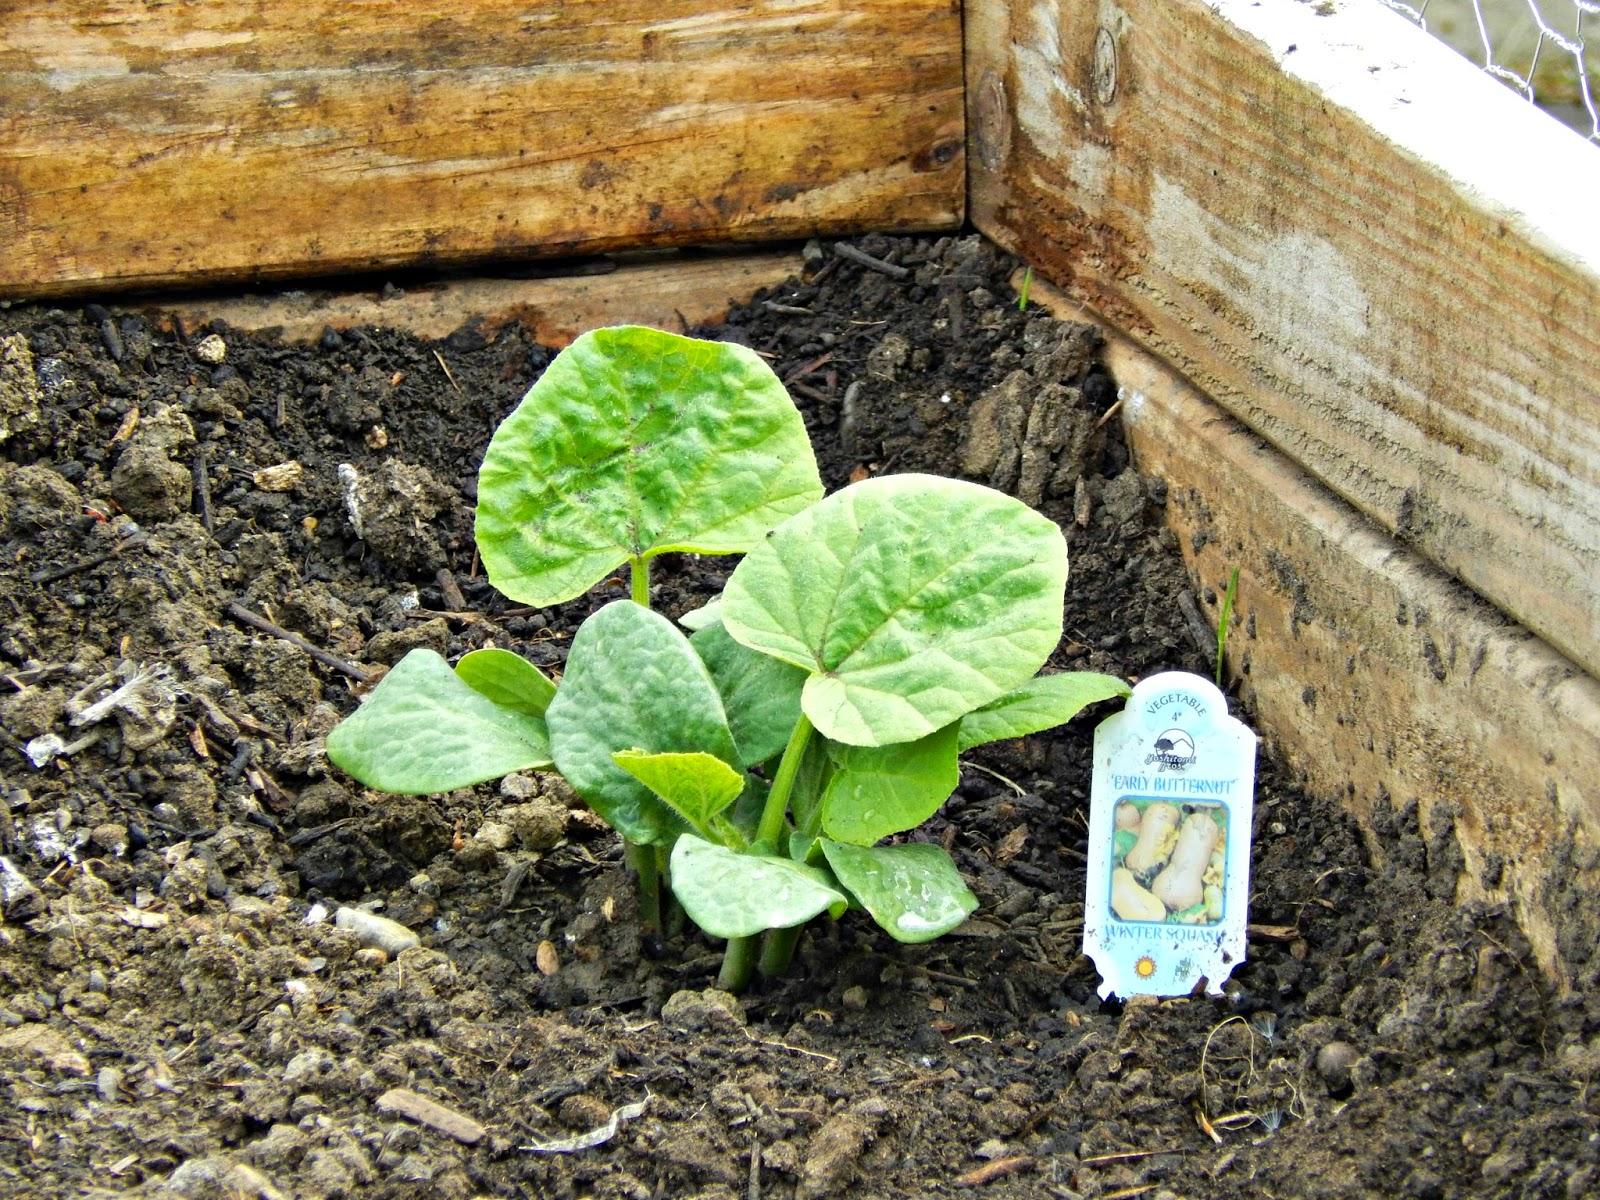 Get Kids Excited About Gardening #RaisingGoodApples AD